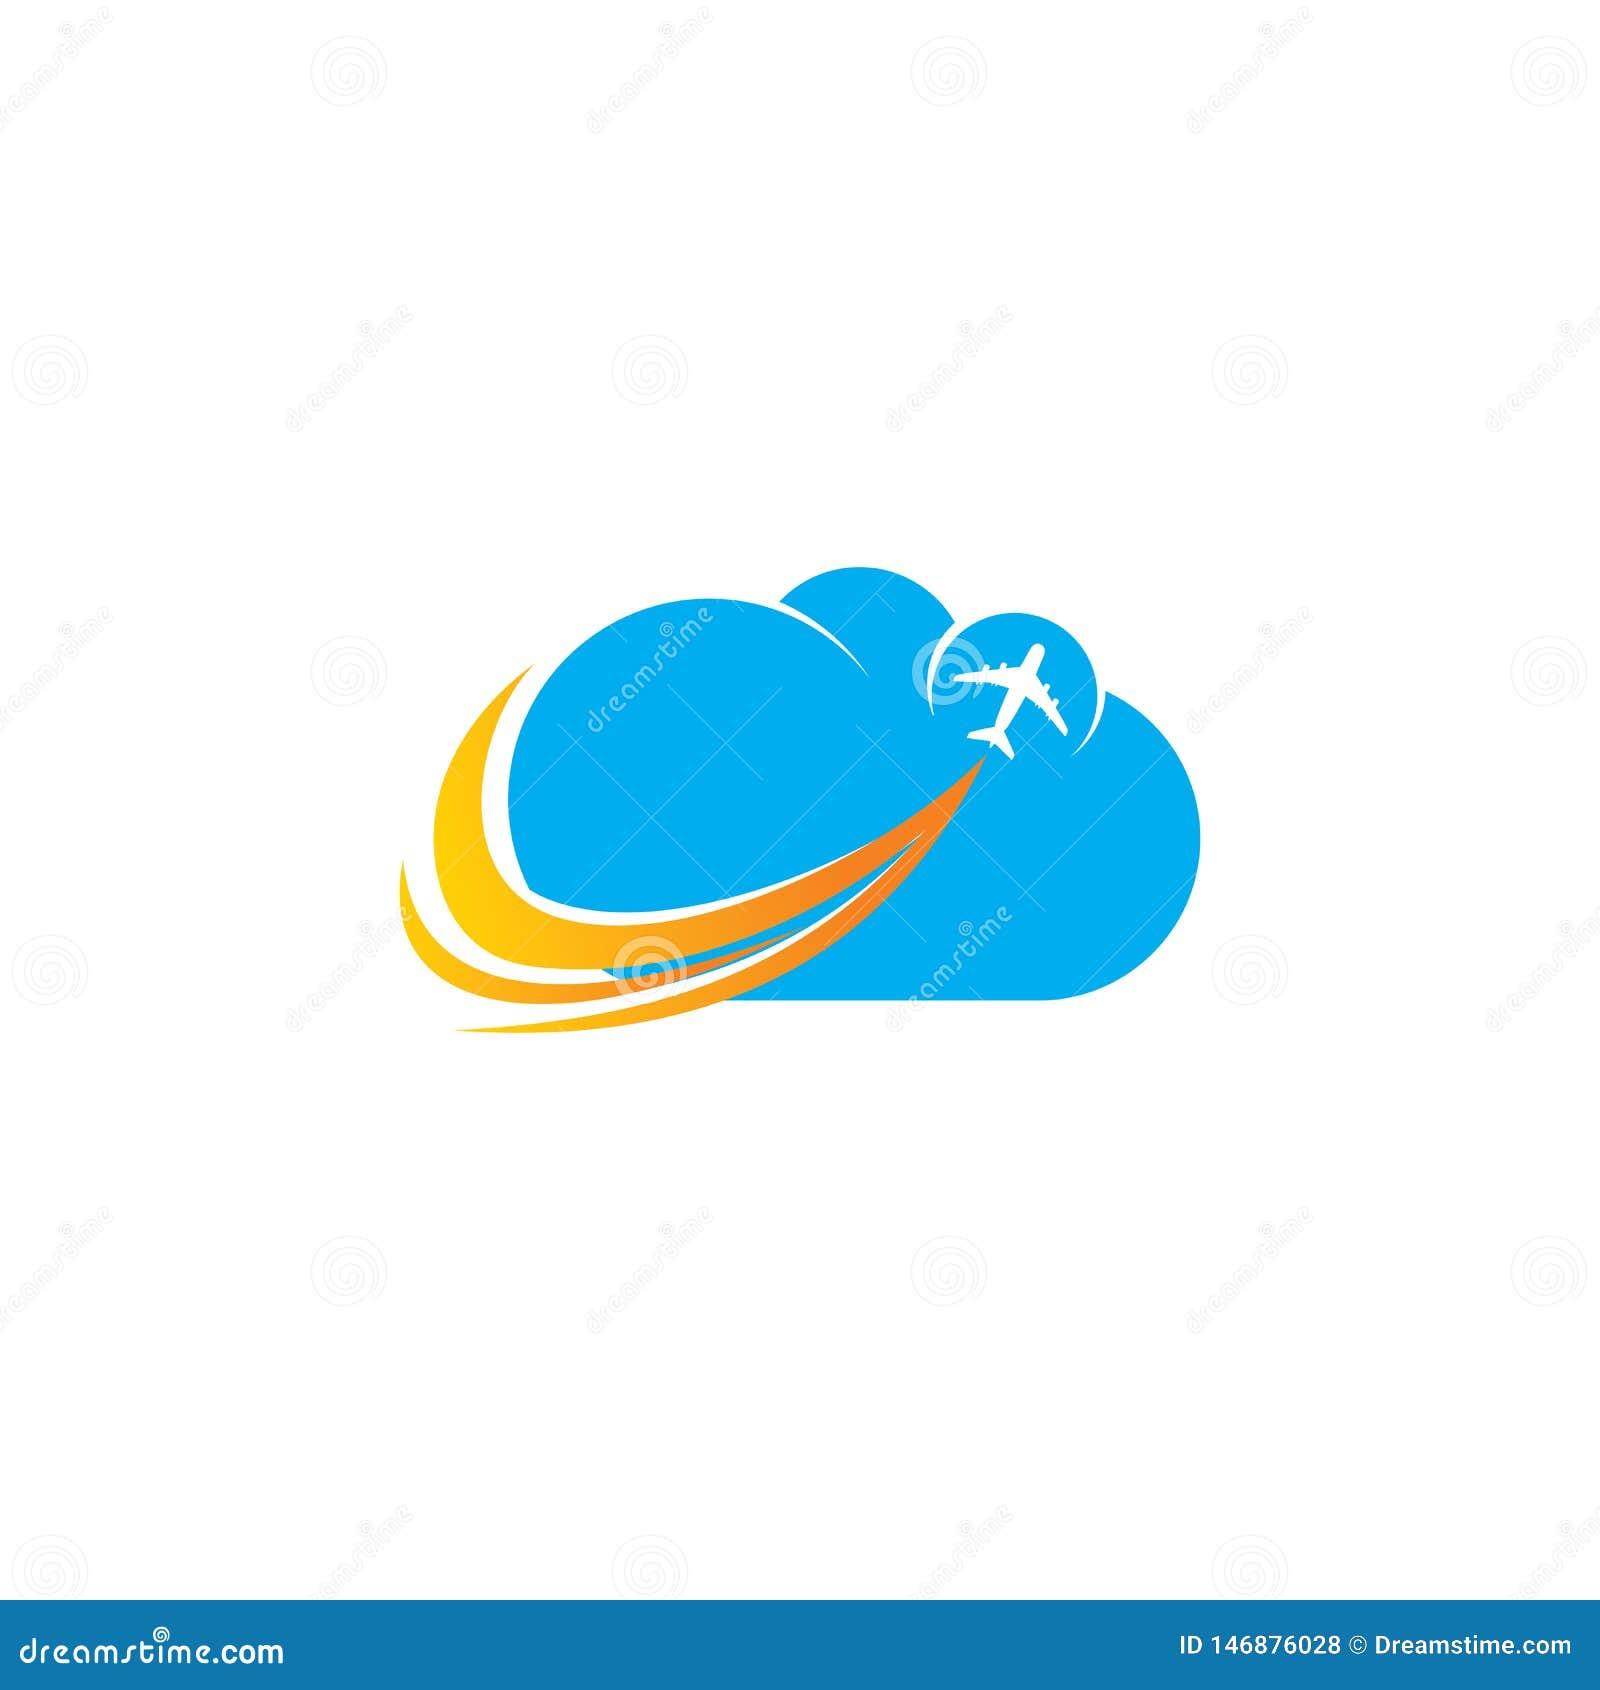 Cloud airplane aviation logo Design